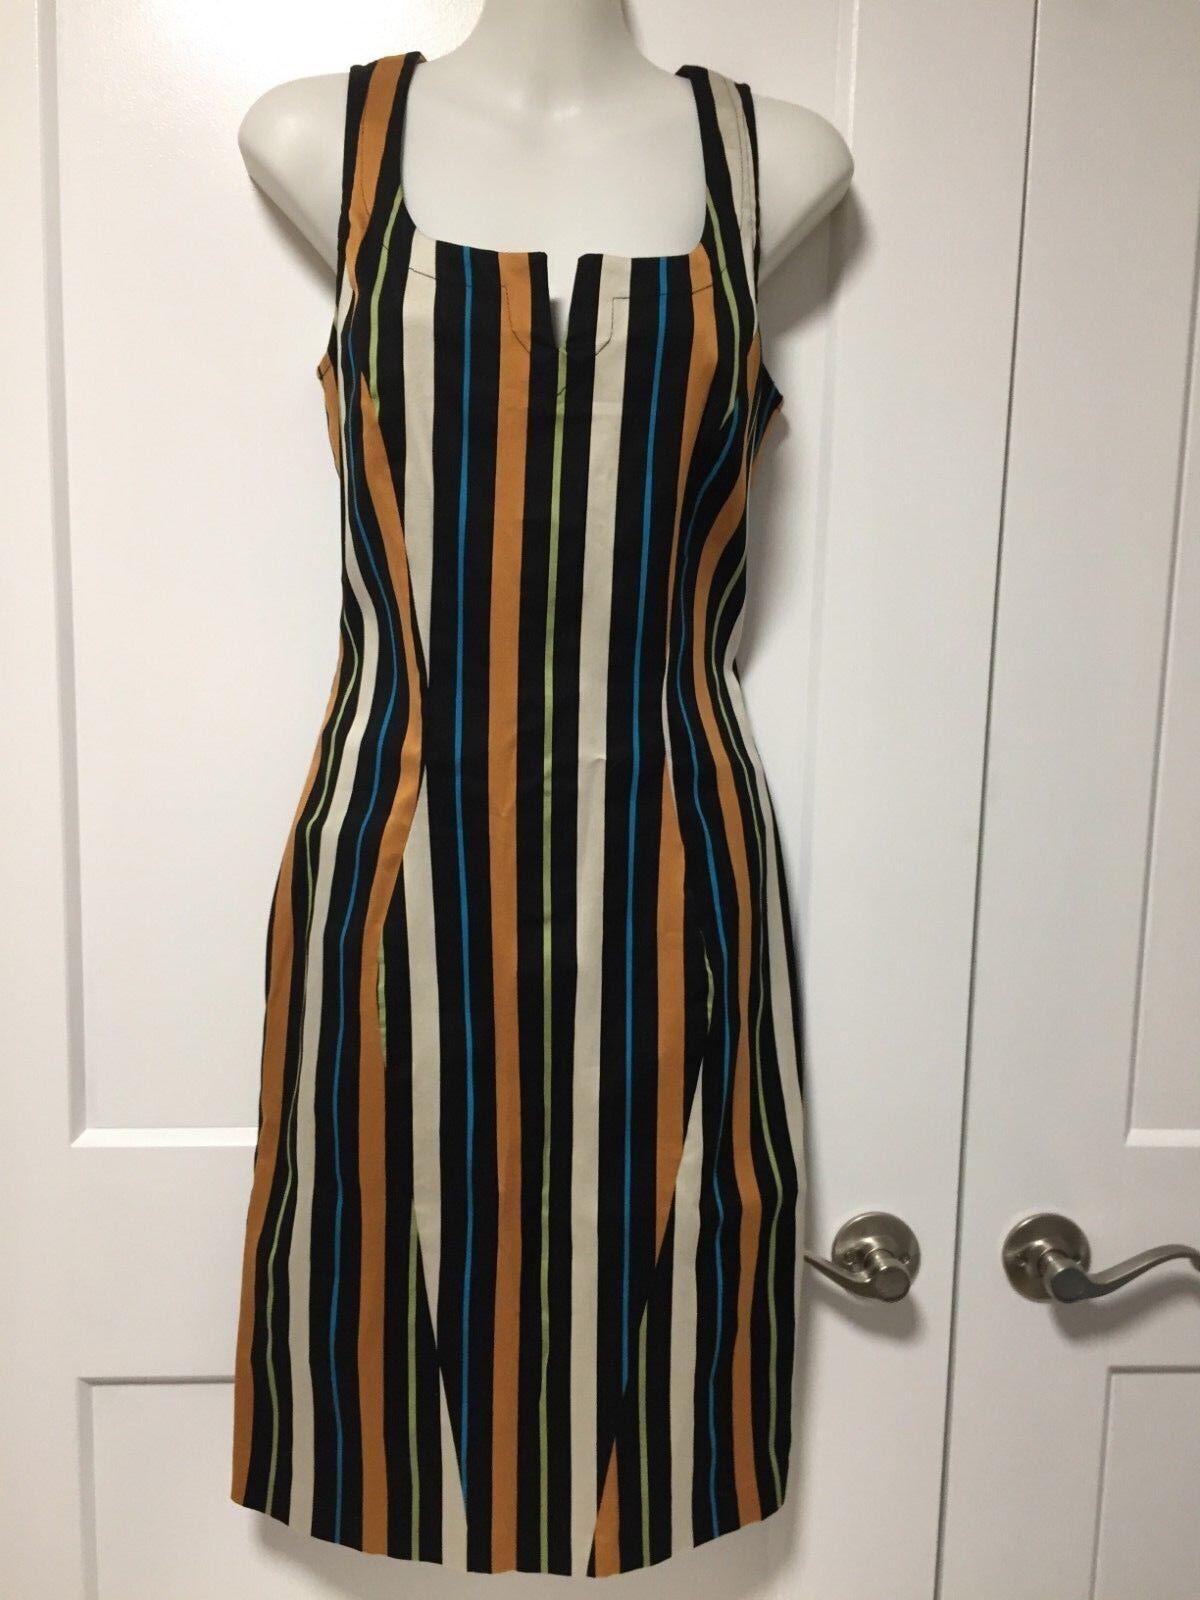 NWT HANITA cotton blend stripes dress. dress. dress. SZ M, fits S 22bd95